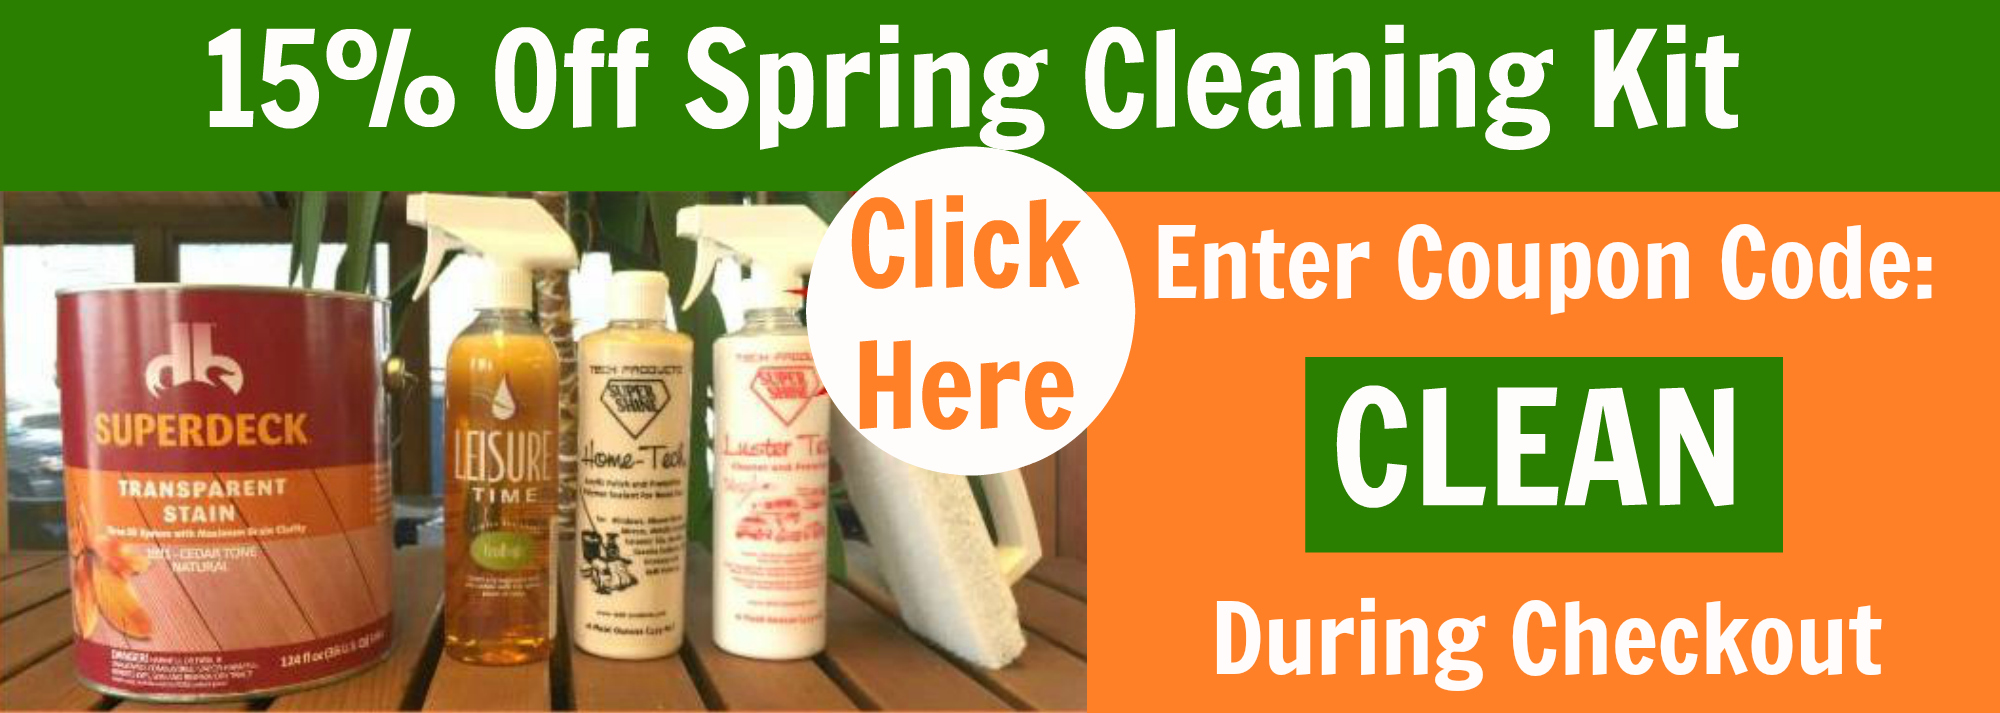 spring-cleaning-banner.jpg